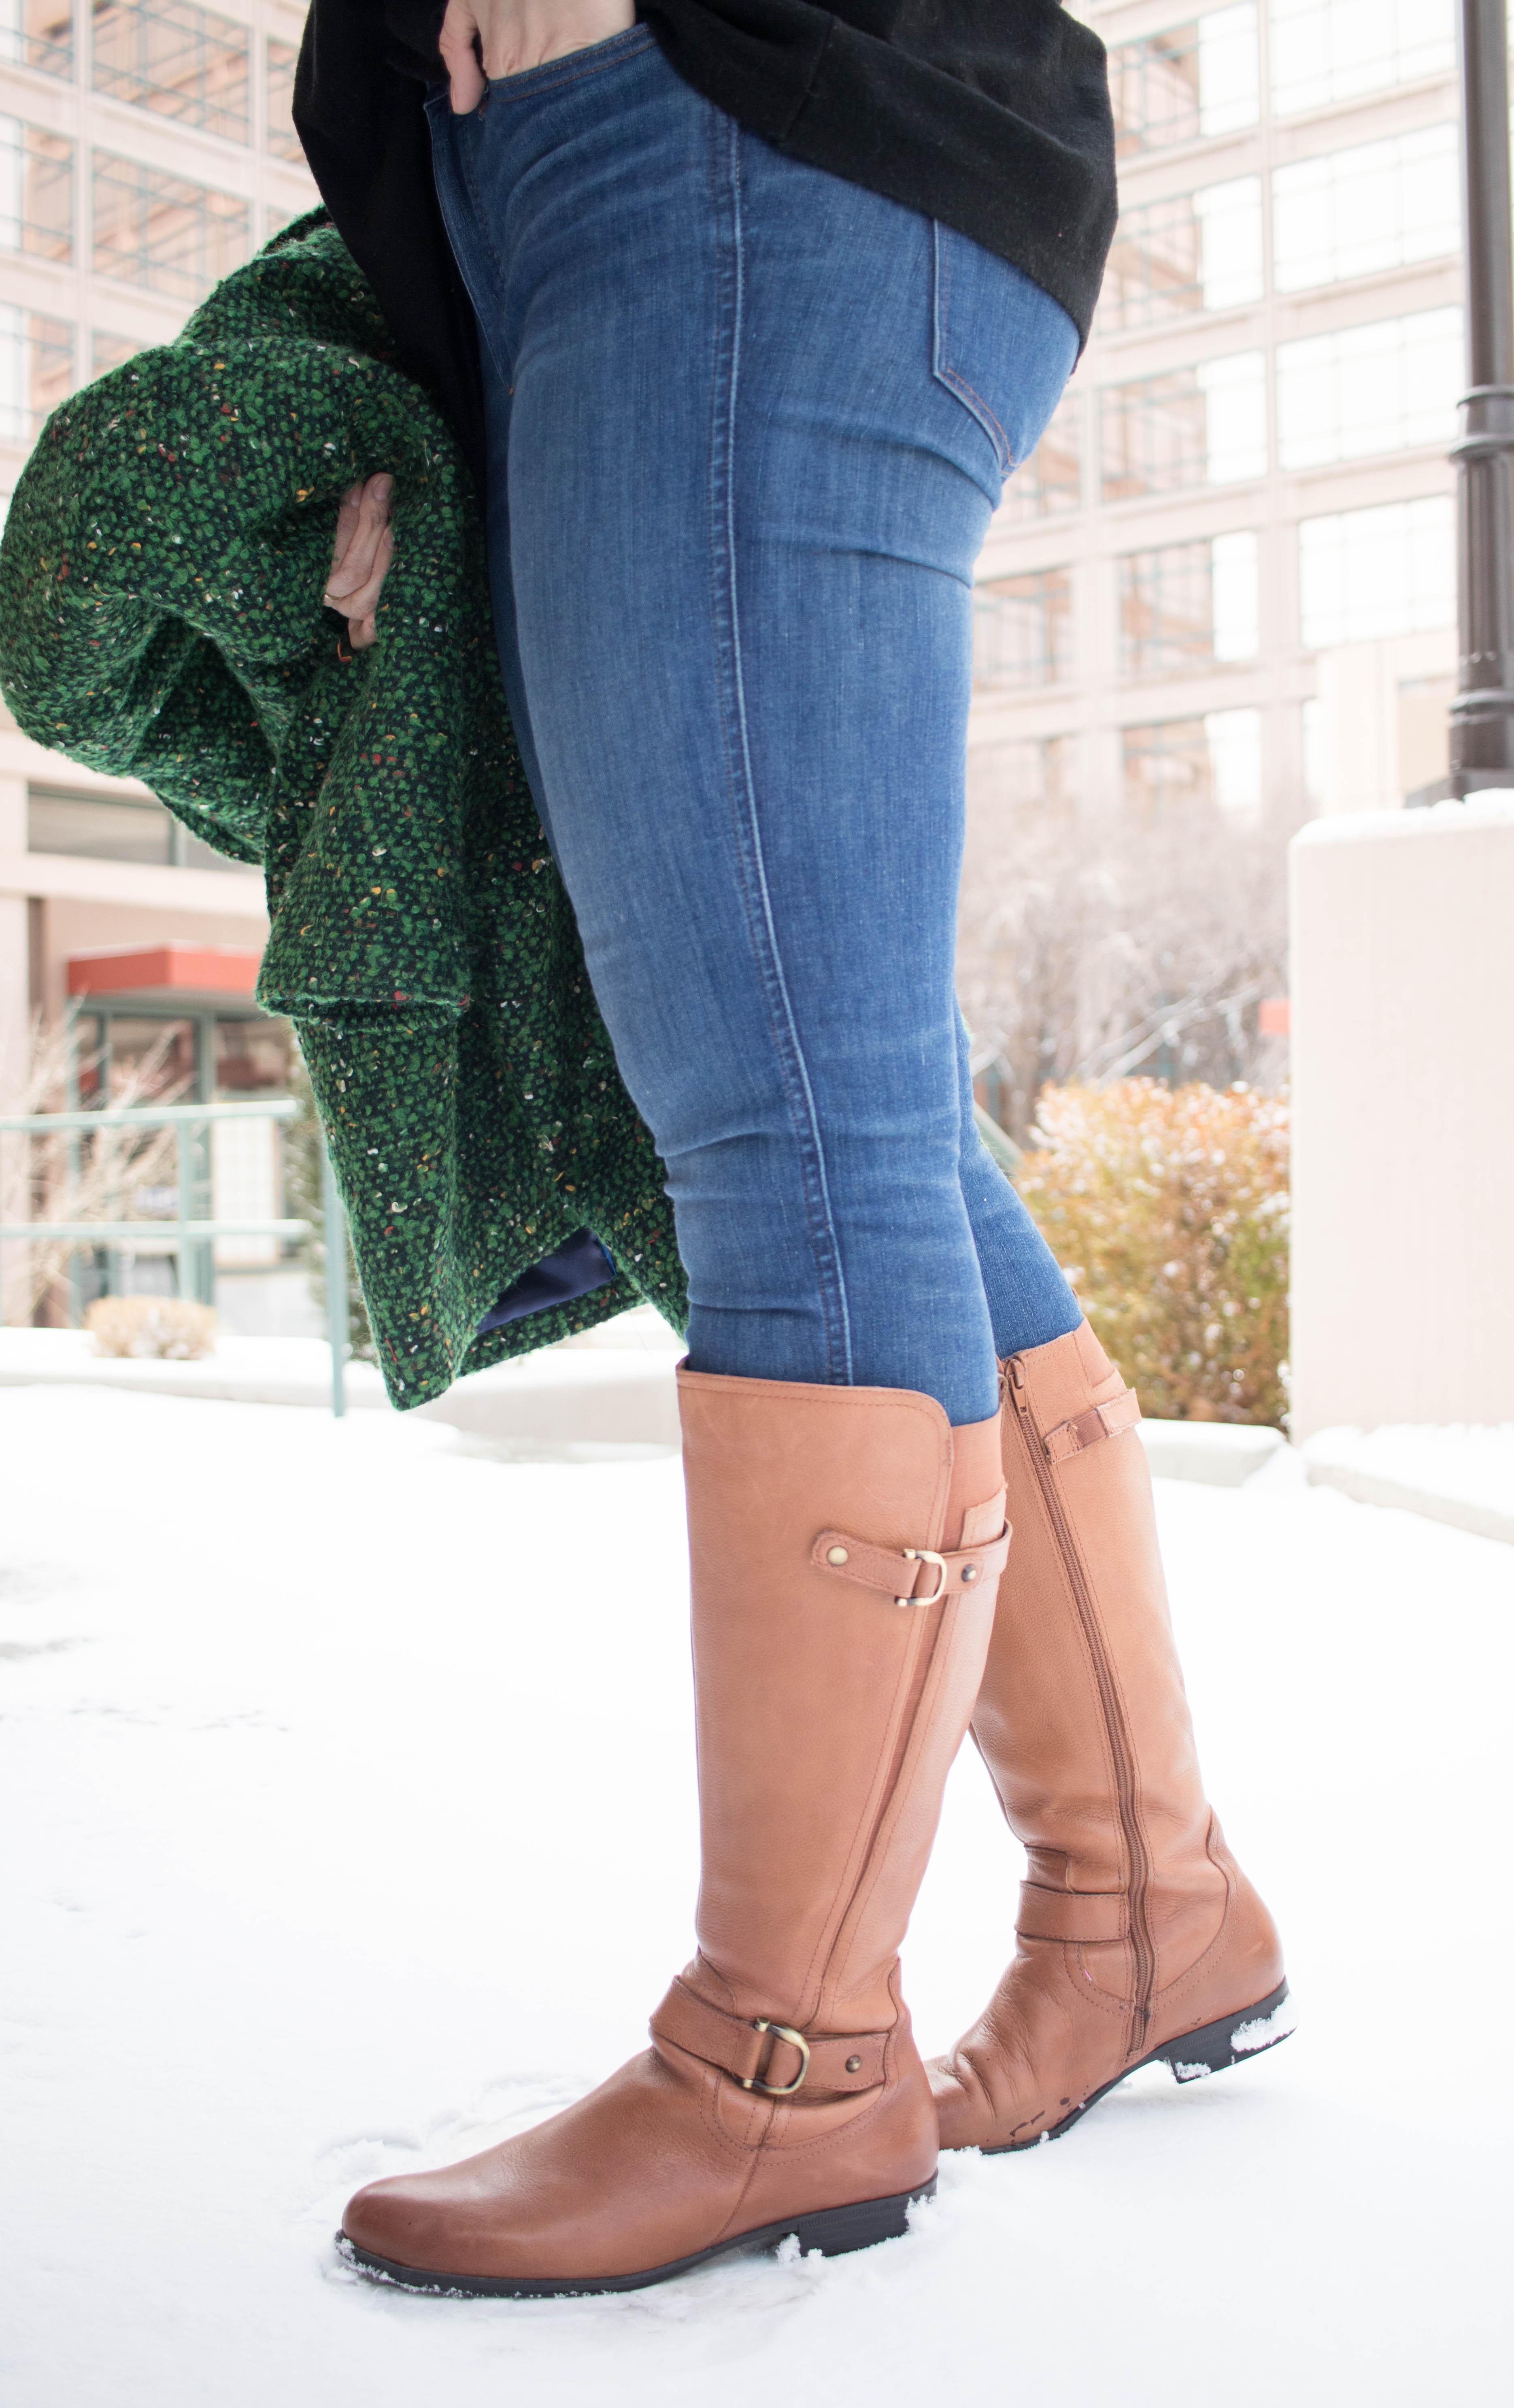 naturalizer jillian boots Macy's #macys #boots #ridingboots